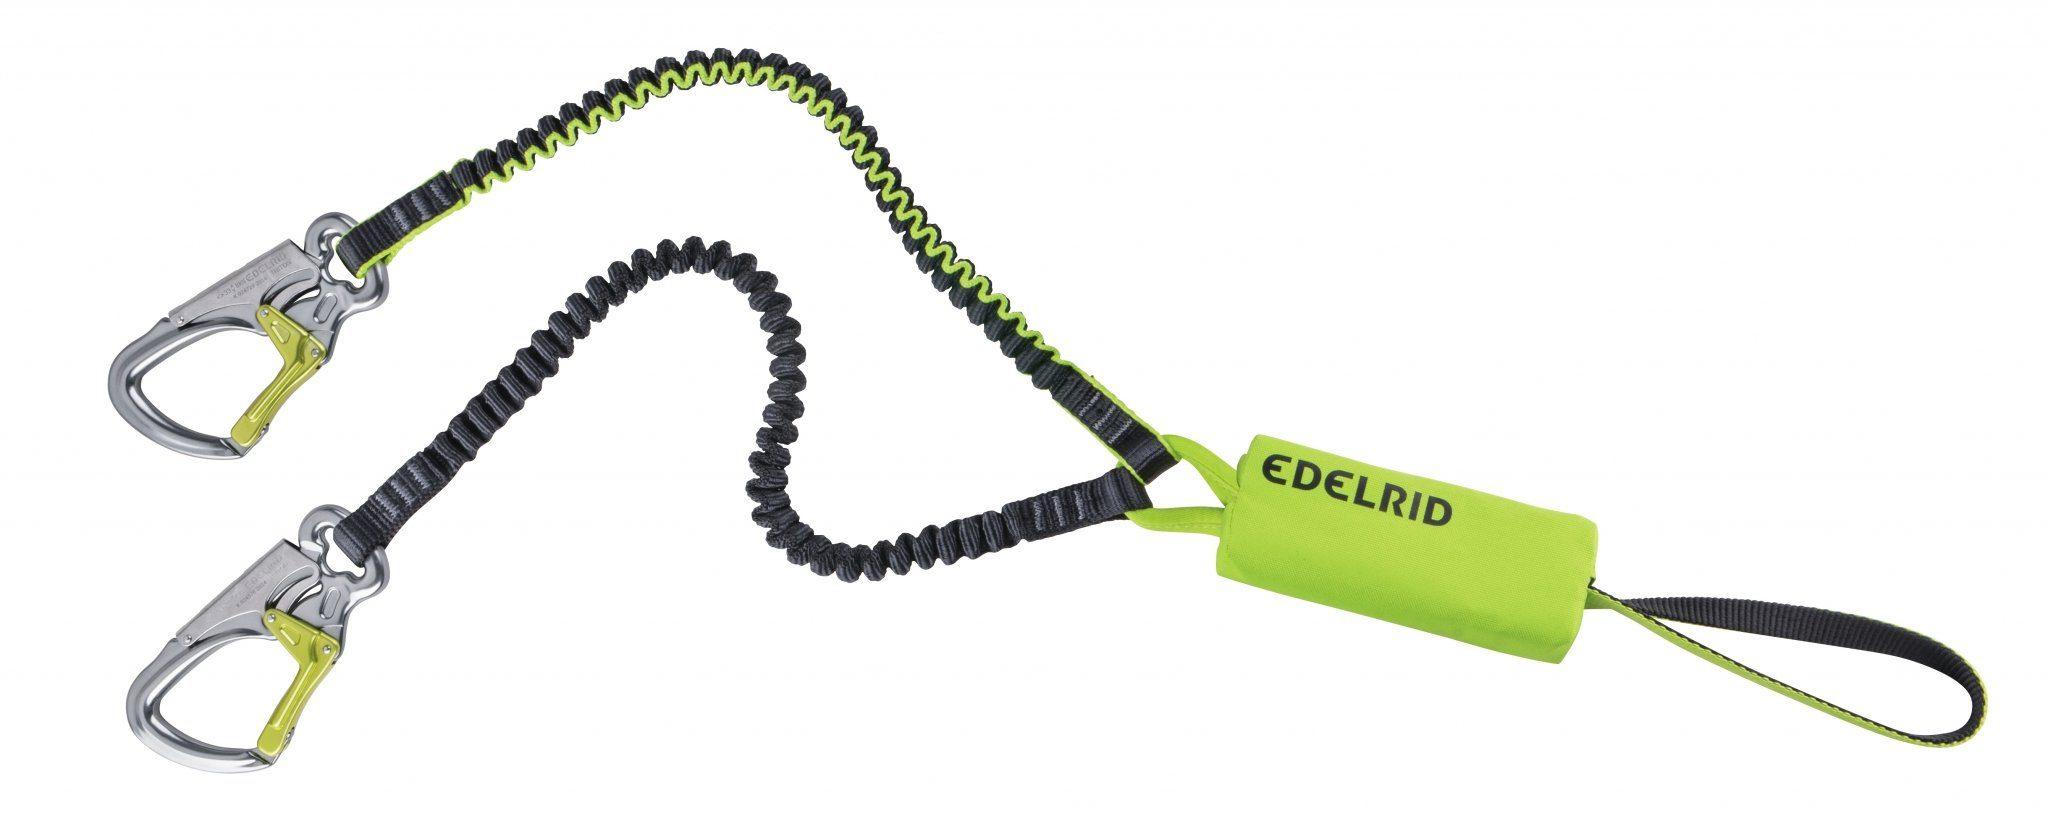 Edelrid Klettersteigset »Cable Kit Lite 5.0 Via Ferrata Set«